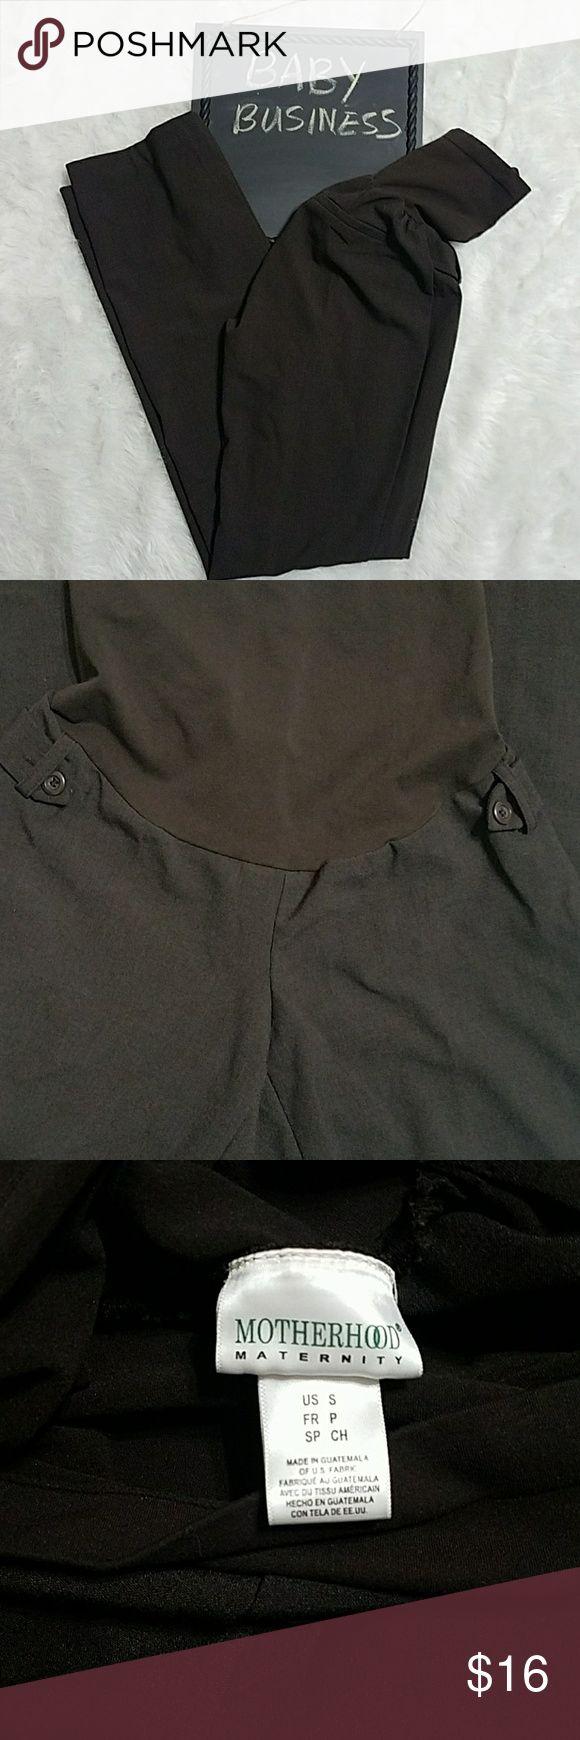 ??  Motherhood Maternity Dress Pants Dark Brown Slacks Inseam 21 inches Motherhood Maternity Pants Trousers